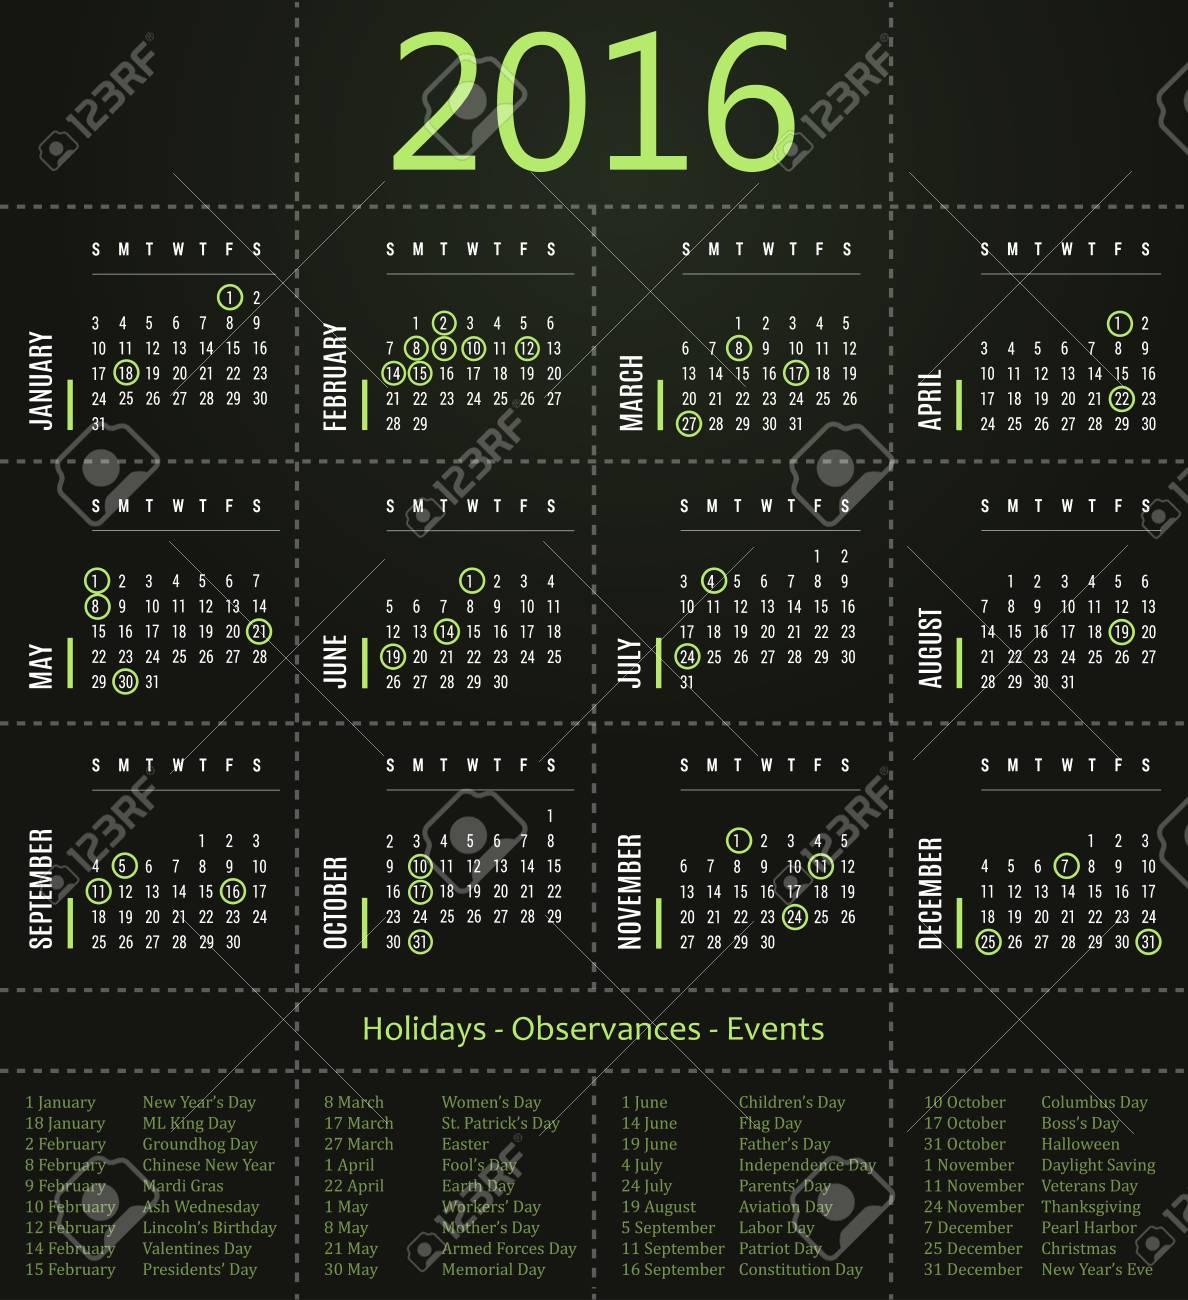 2016 Calendar Template With Holidays, Observances And Events.. in January 16 Holidays & Observances